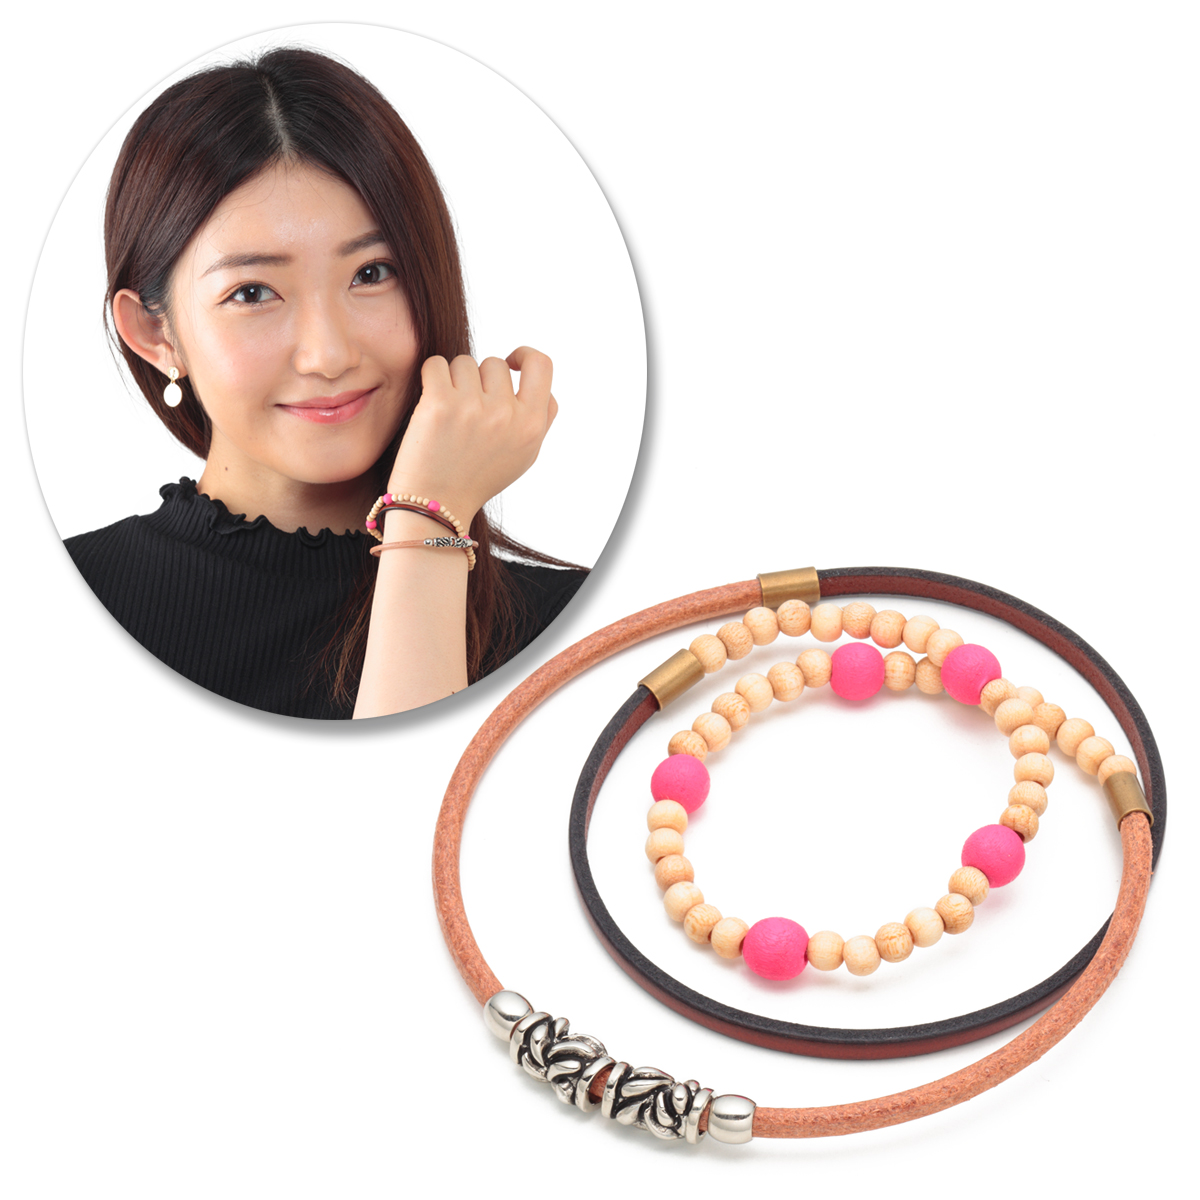 KAMEN RIDER ZI-O Cosplay Bracelet(Tokiwa Sogo)